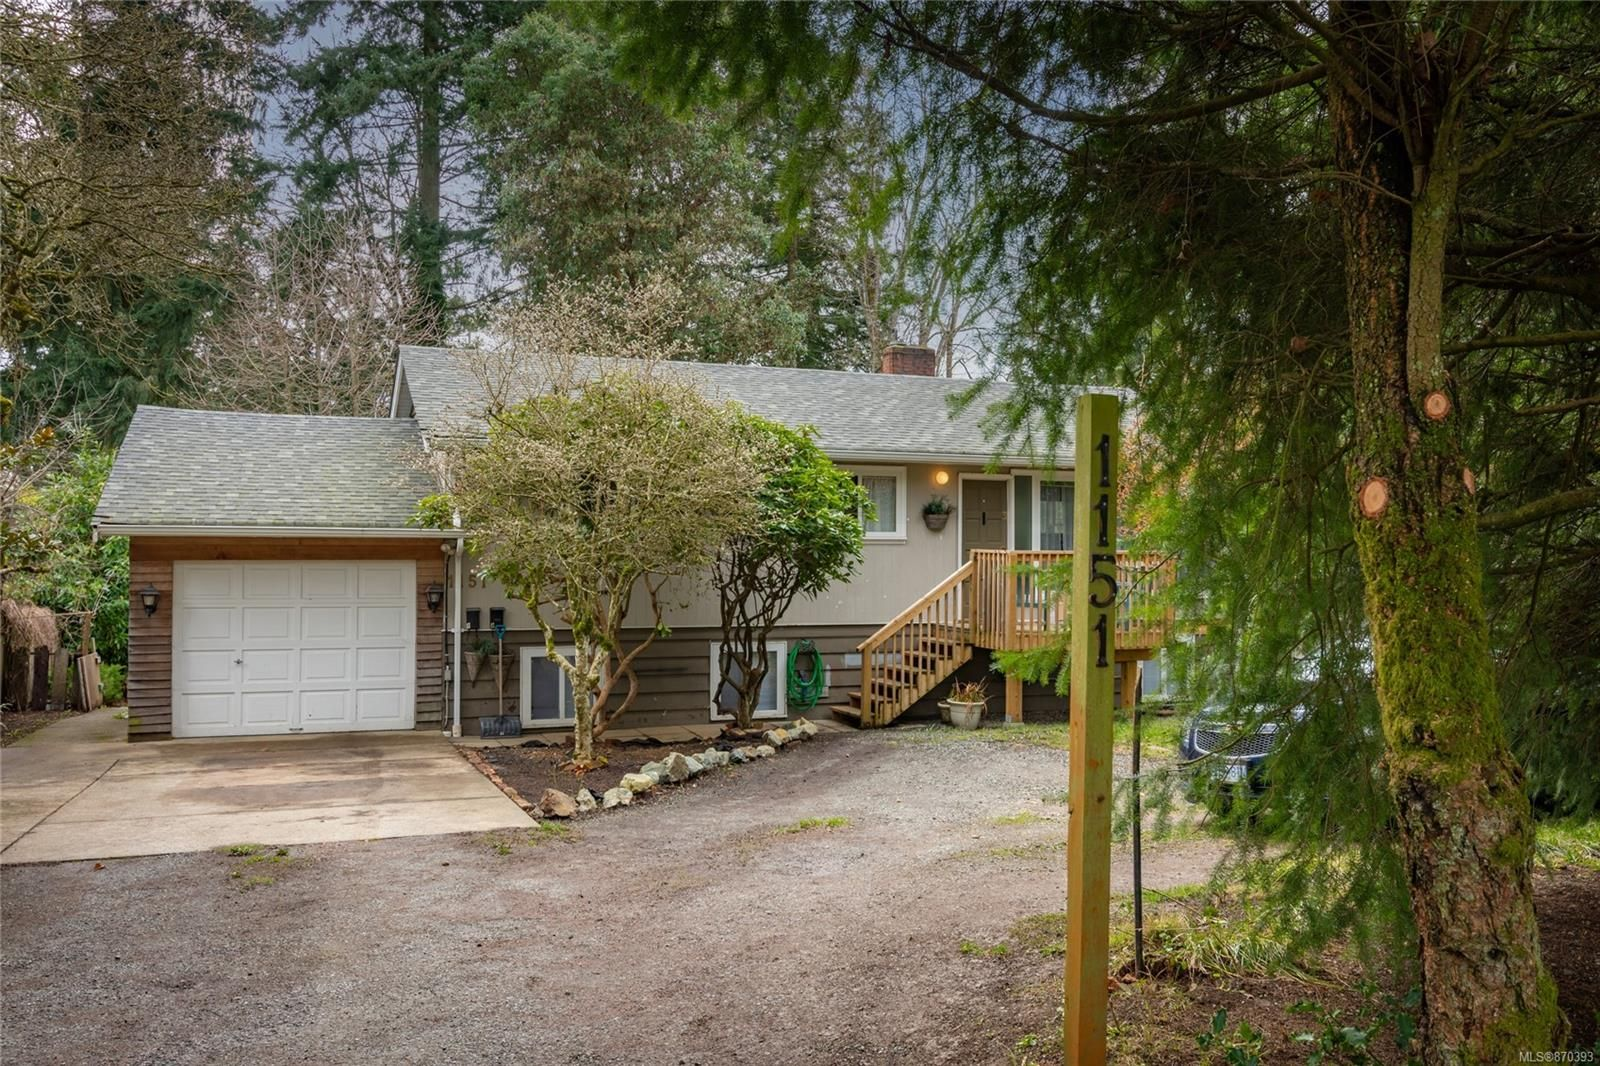 Main Photo: 1151 Bush St in : Na Central Nanaimo House for sale (Nanaimo)  : MLS®# 870393